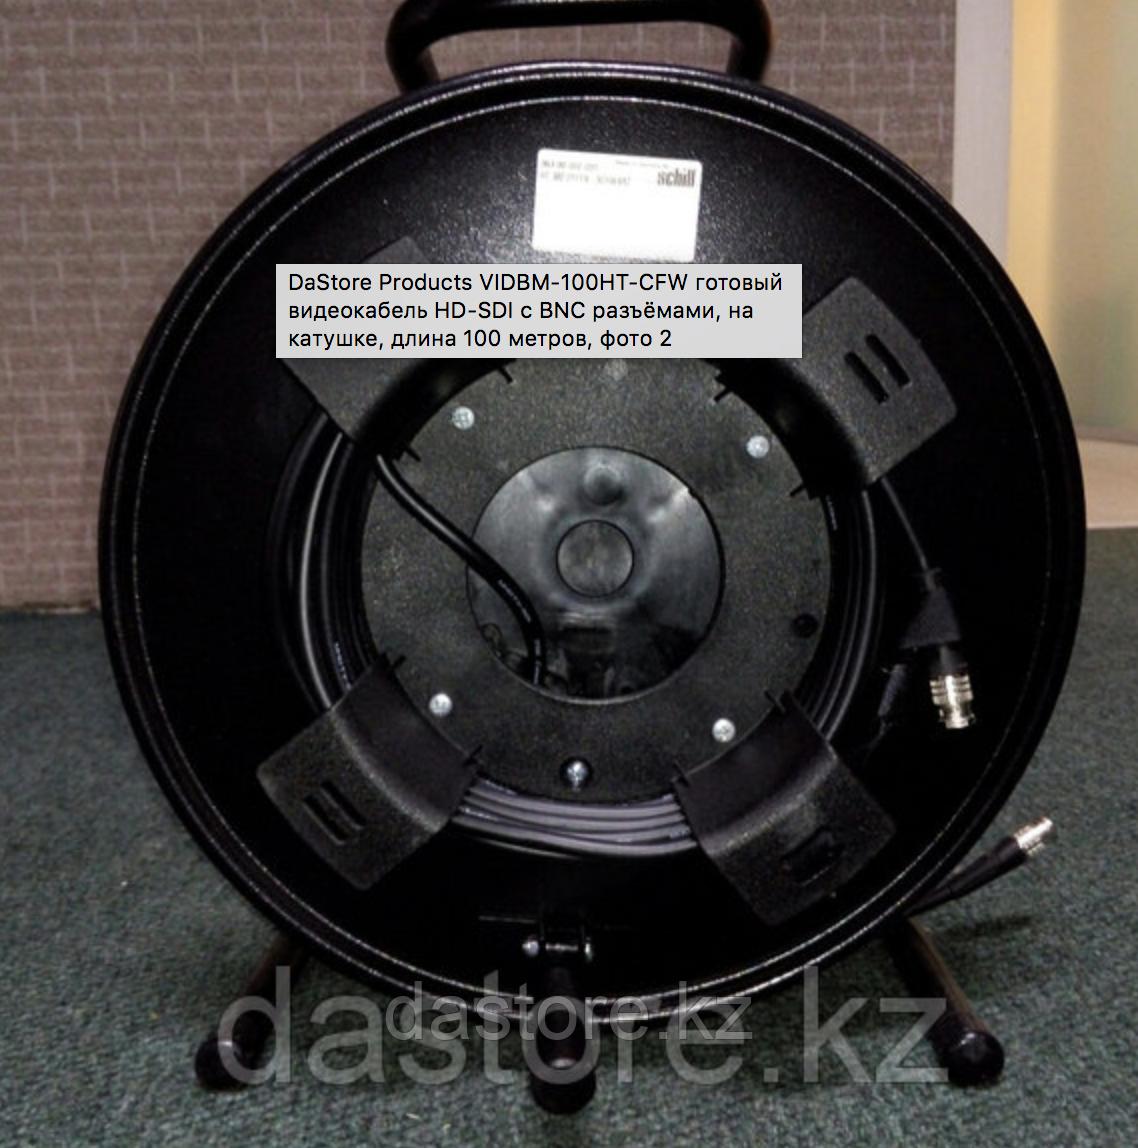 DaStore Products VIDBM-080-3CFW